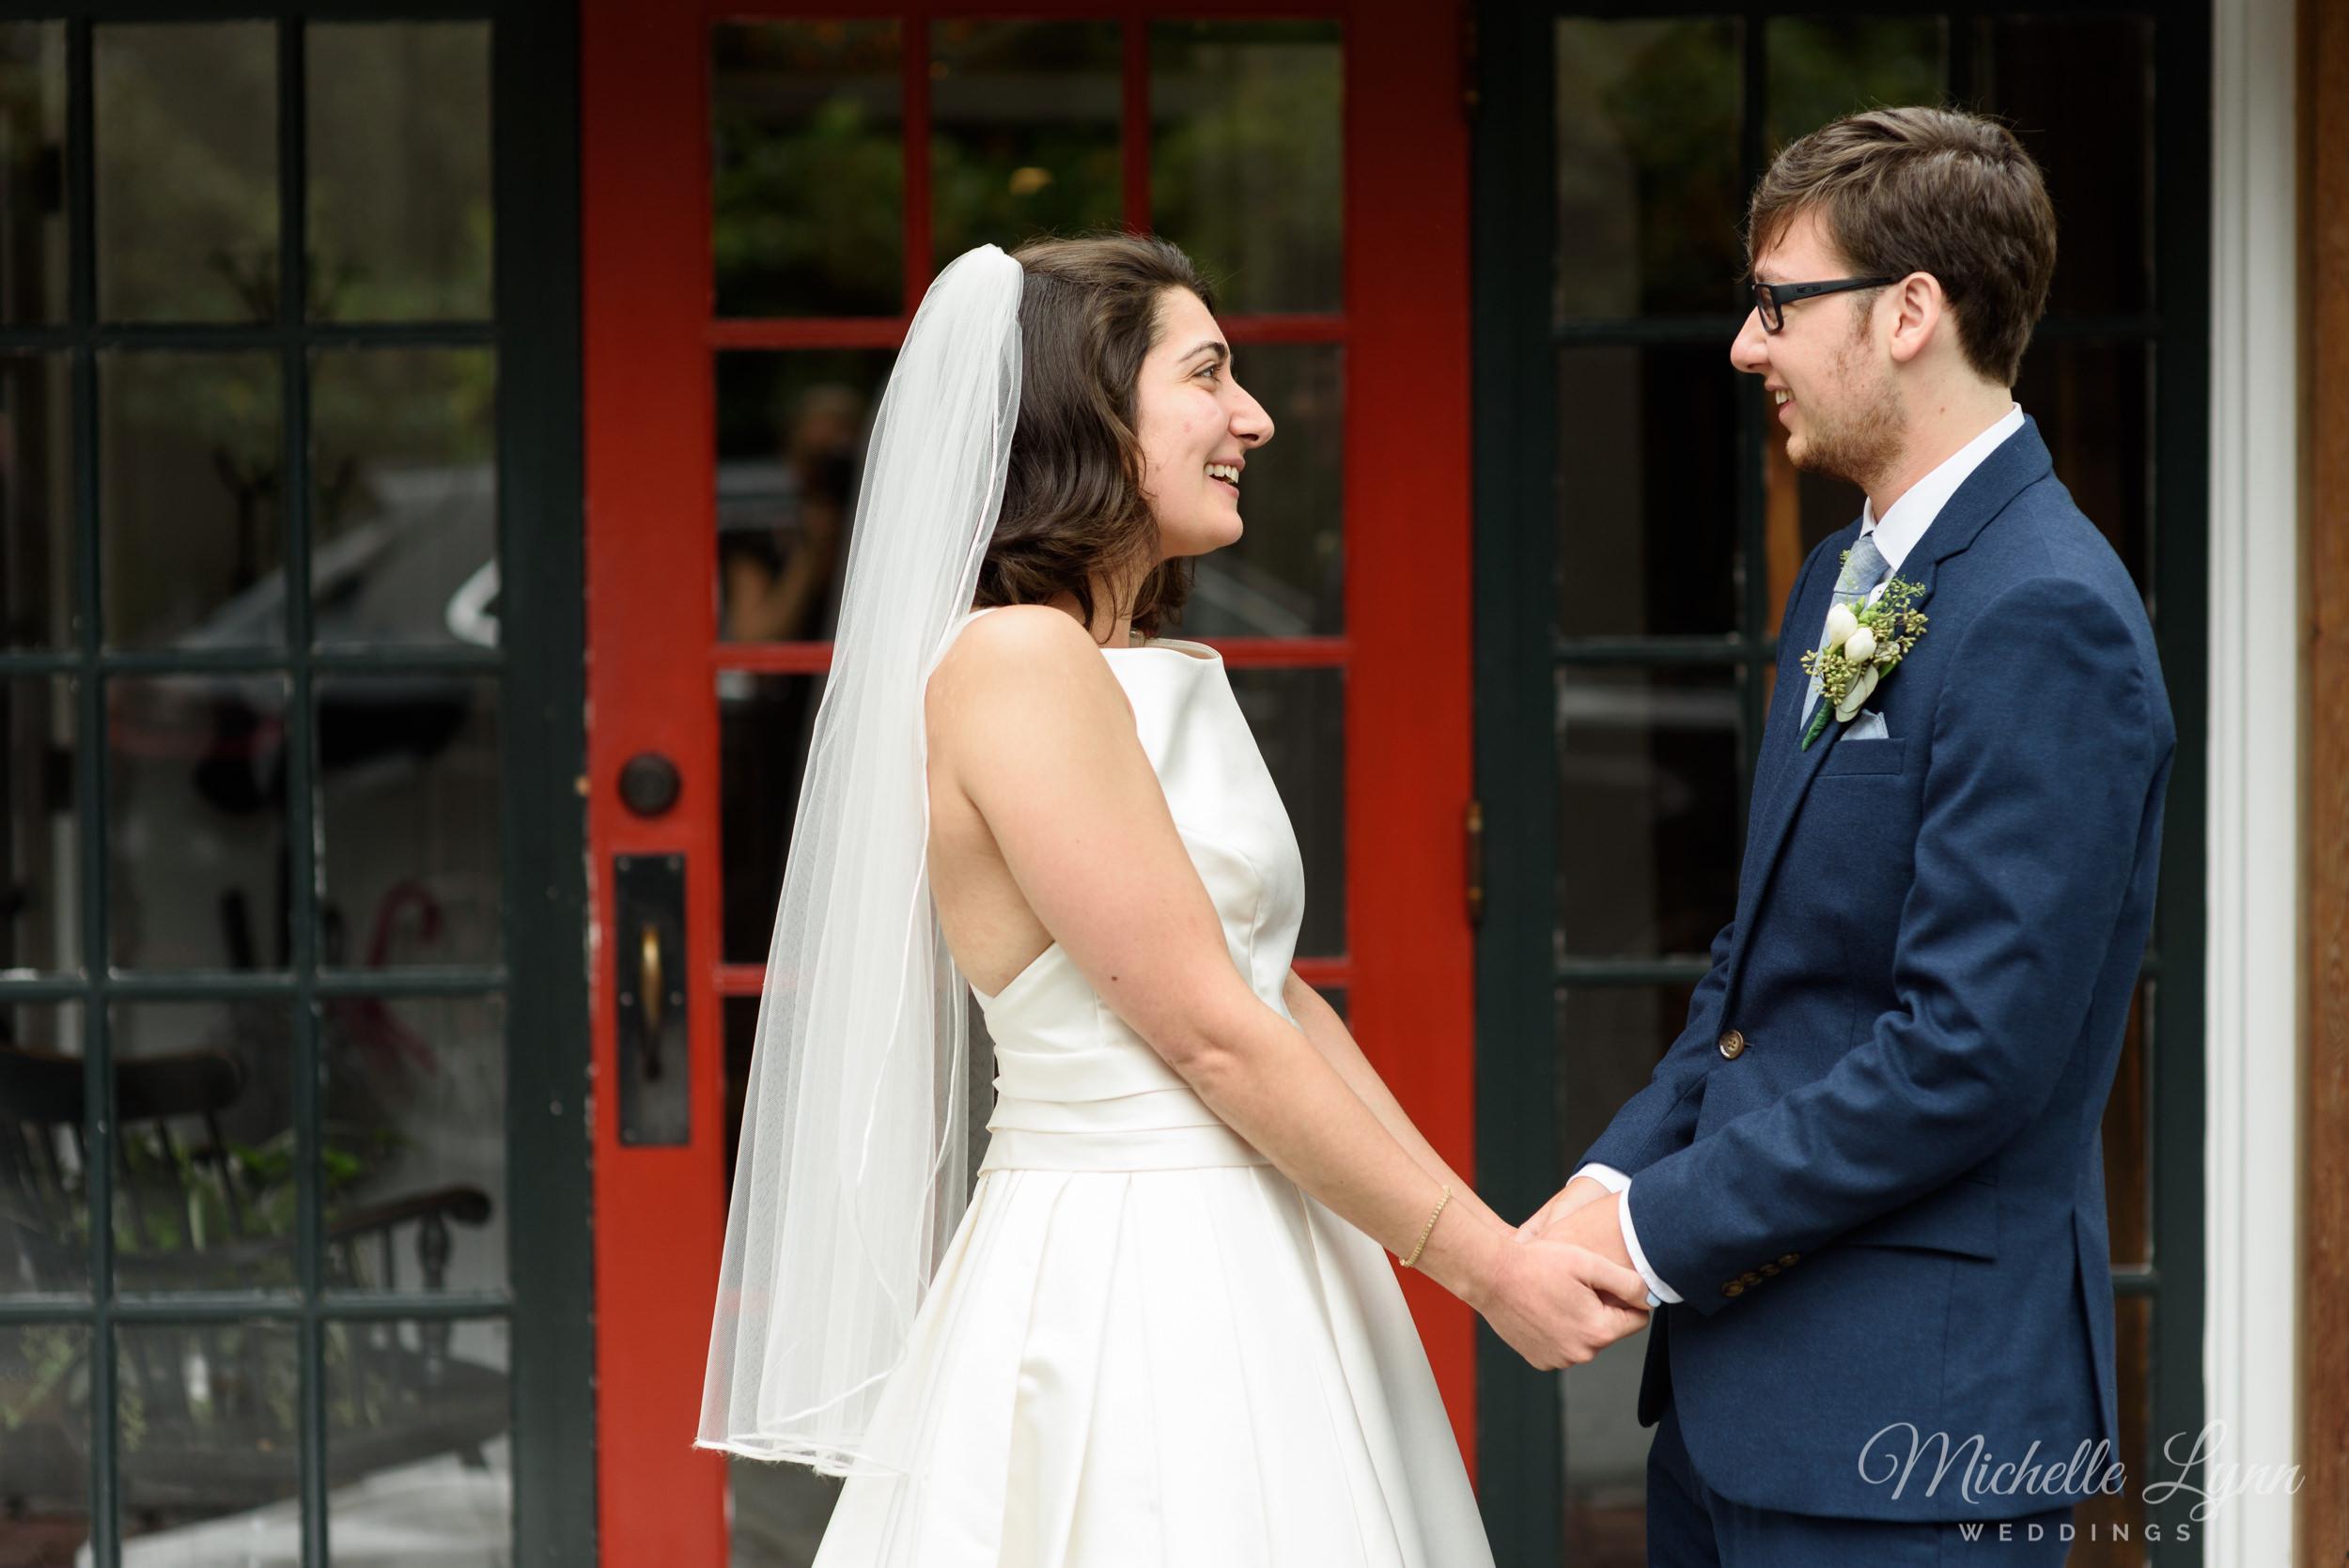 mlw-general-warren-malvern-wedding-photographer-11.jpg